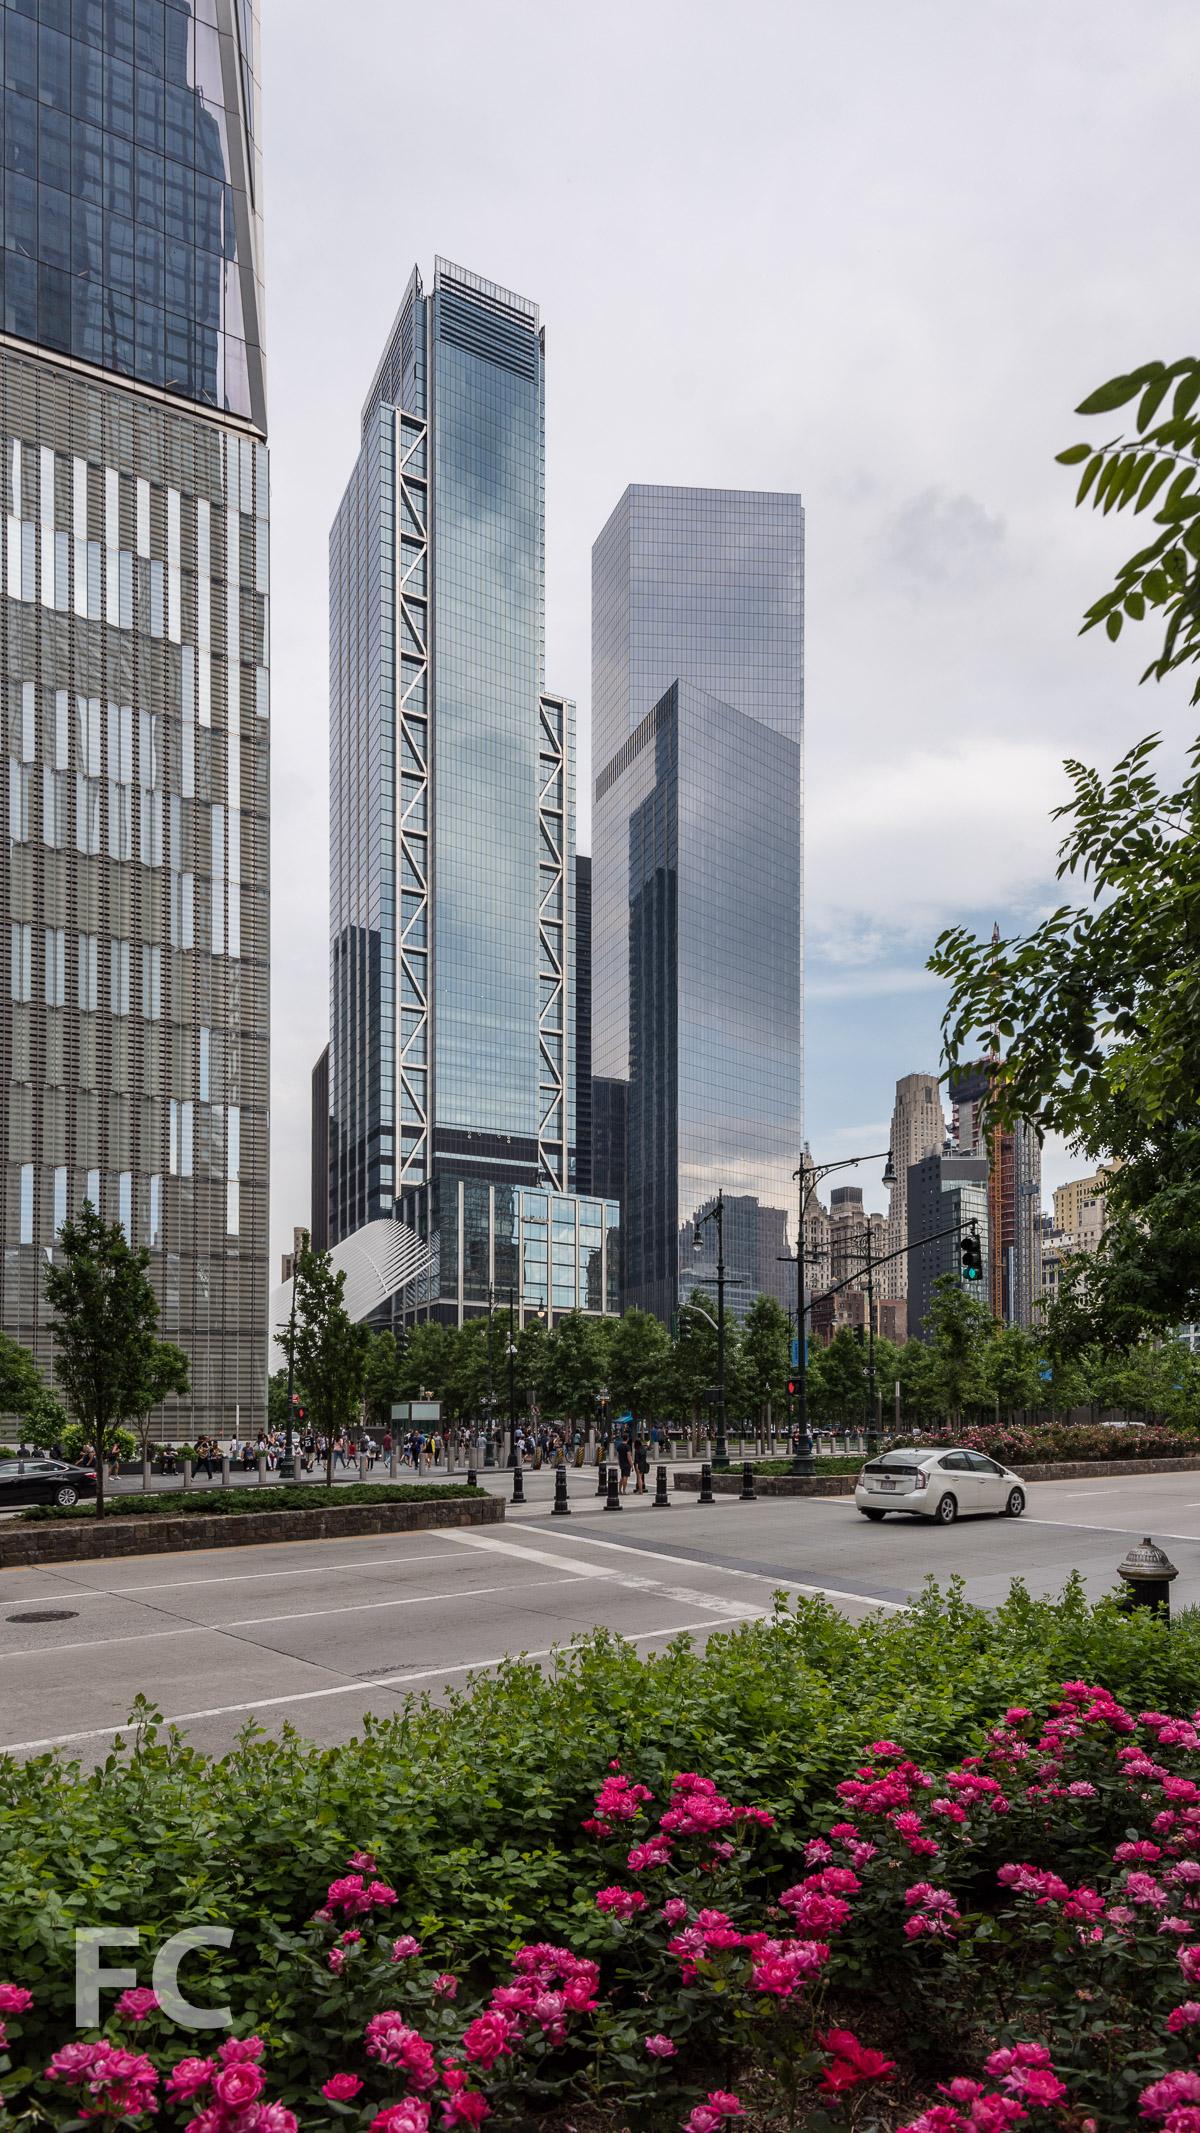 Northwest corner of 3 World Trade Center (center) and 4 World Trade Center (right).